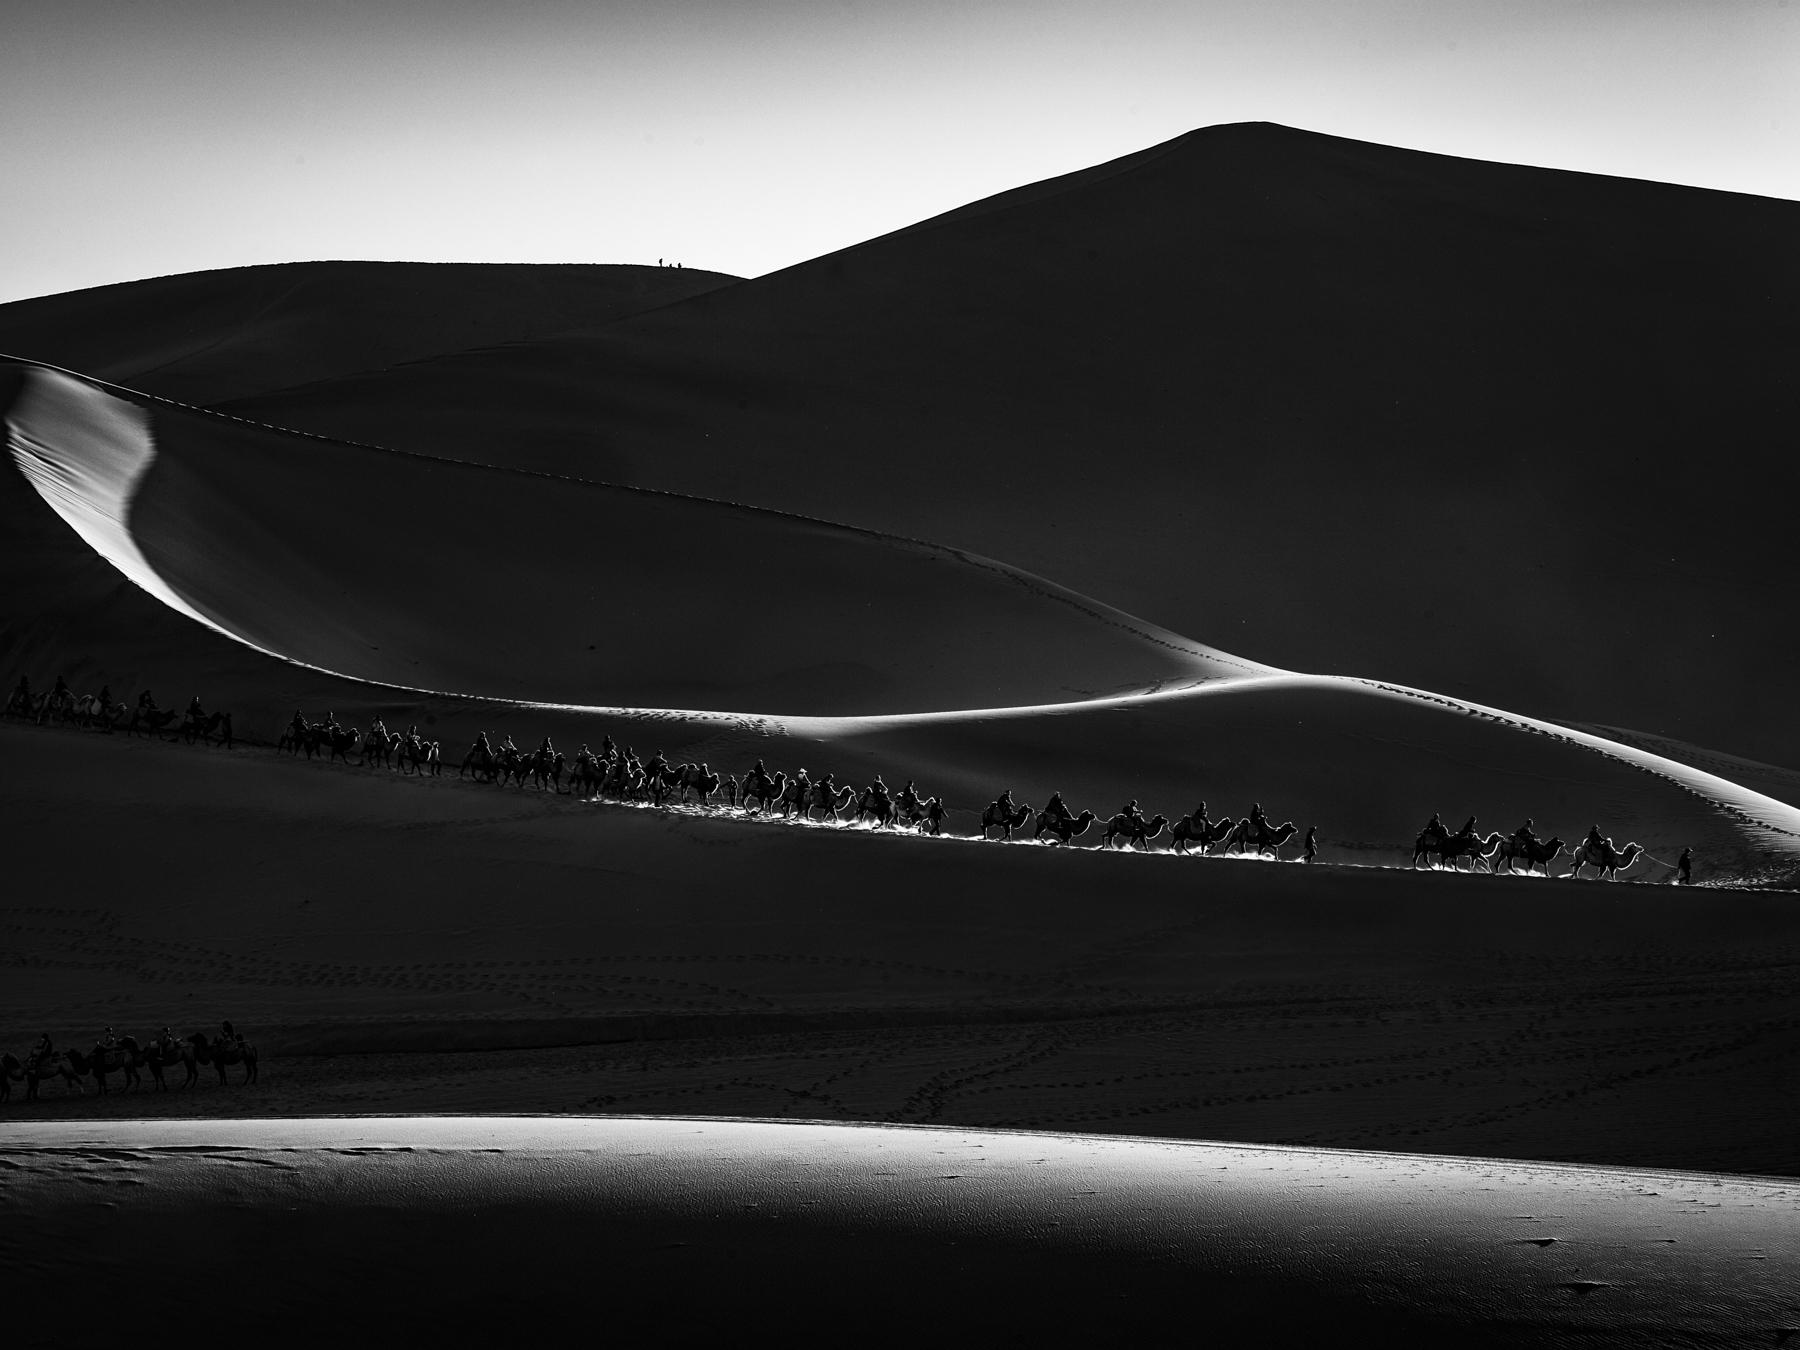 John_Eaton_Along The Silk Road.jpg